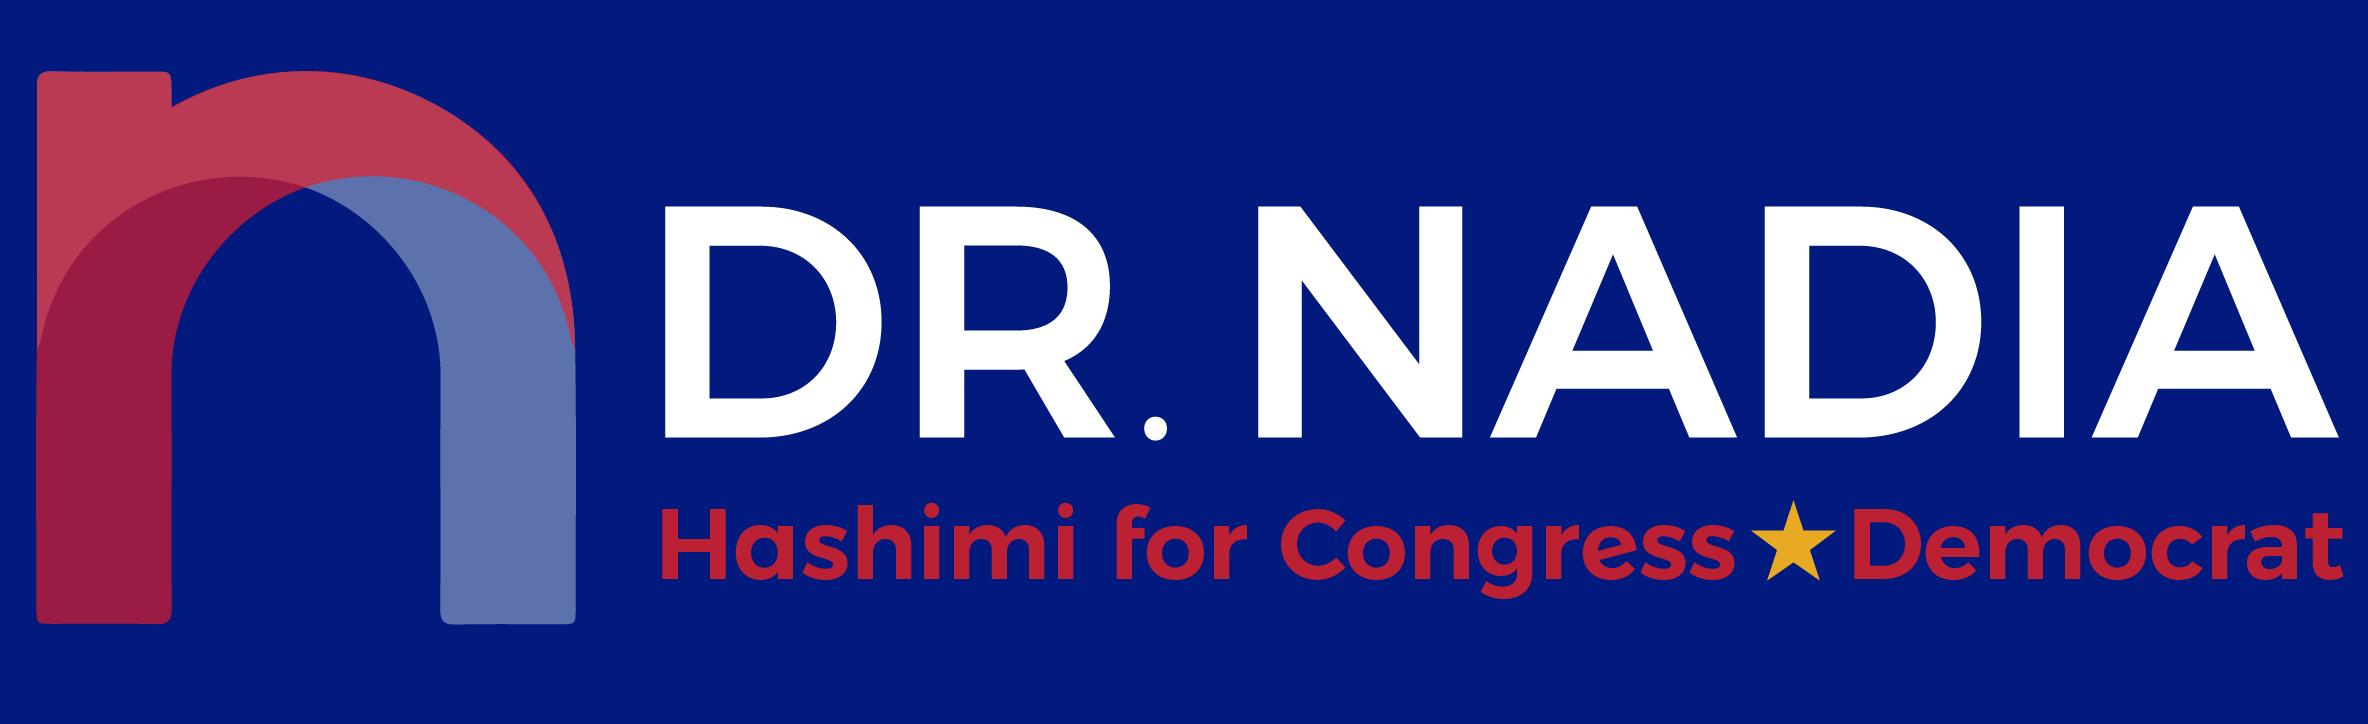 hashimi logo.png